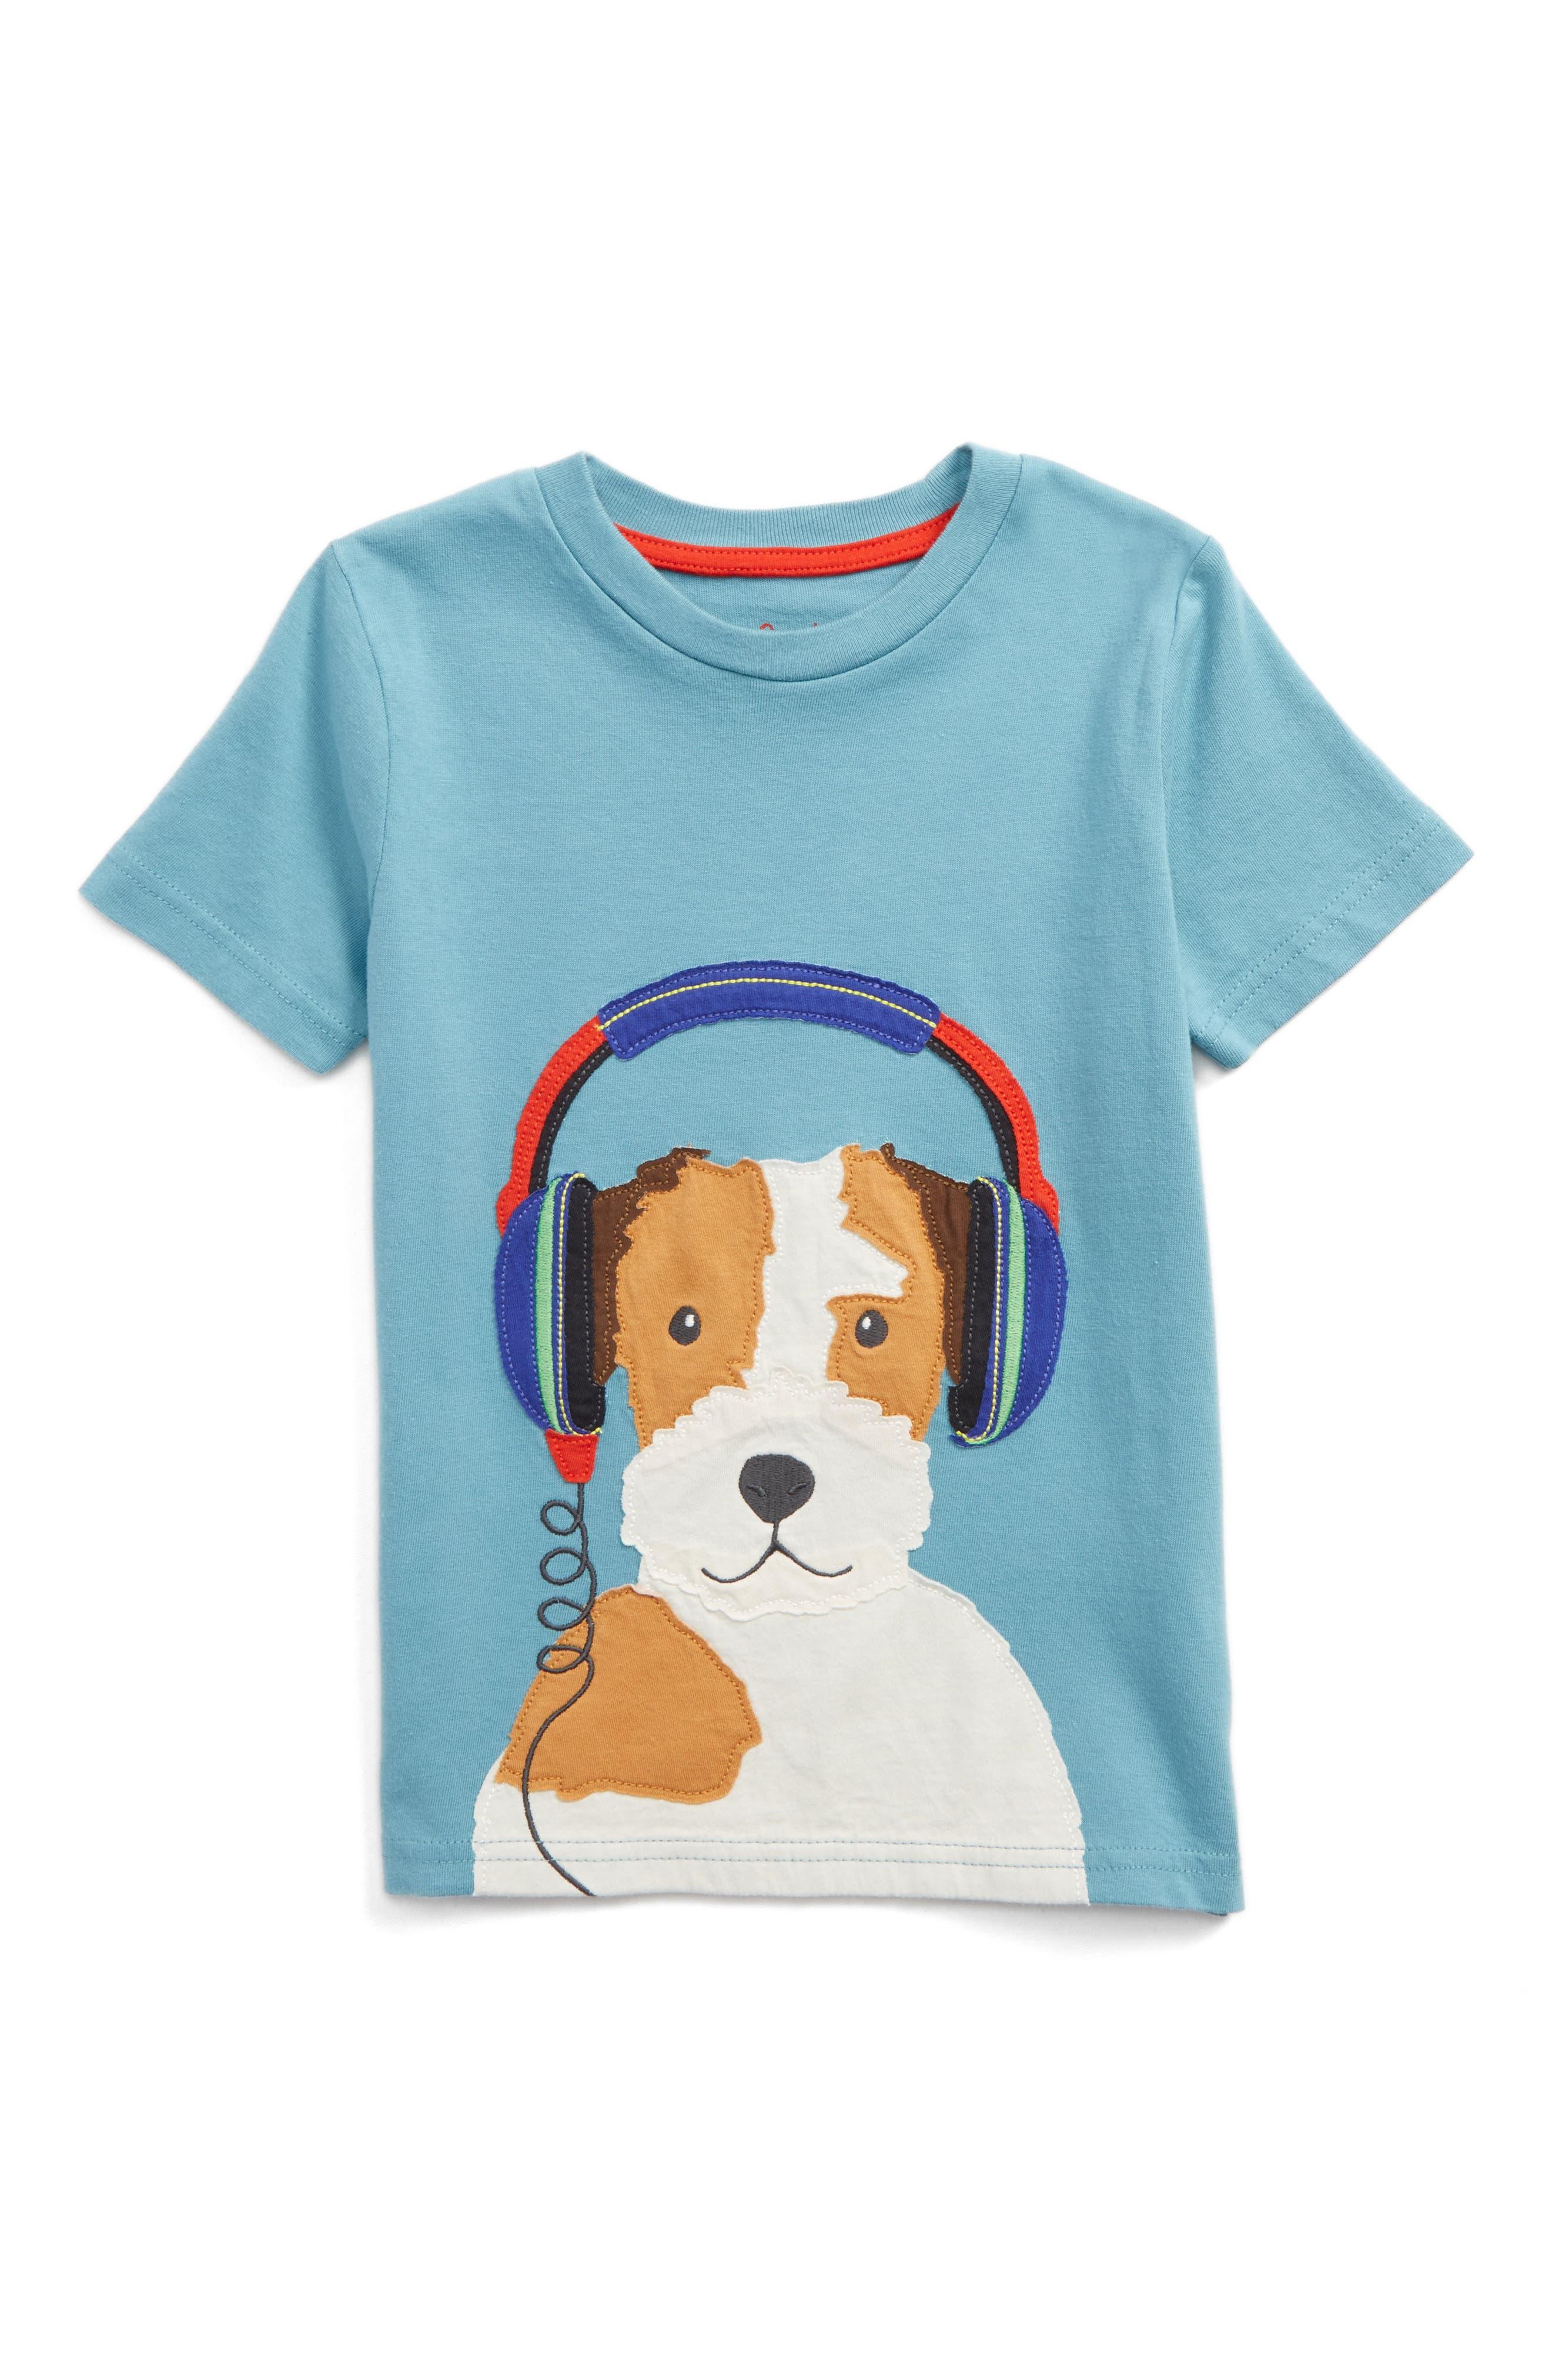 Music Appliqué T-Shirt,                         Main,                         color, Ocean Scene Blue Headphones